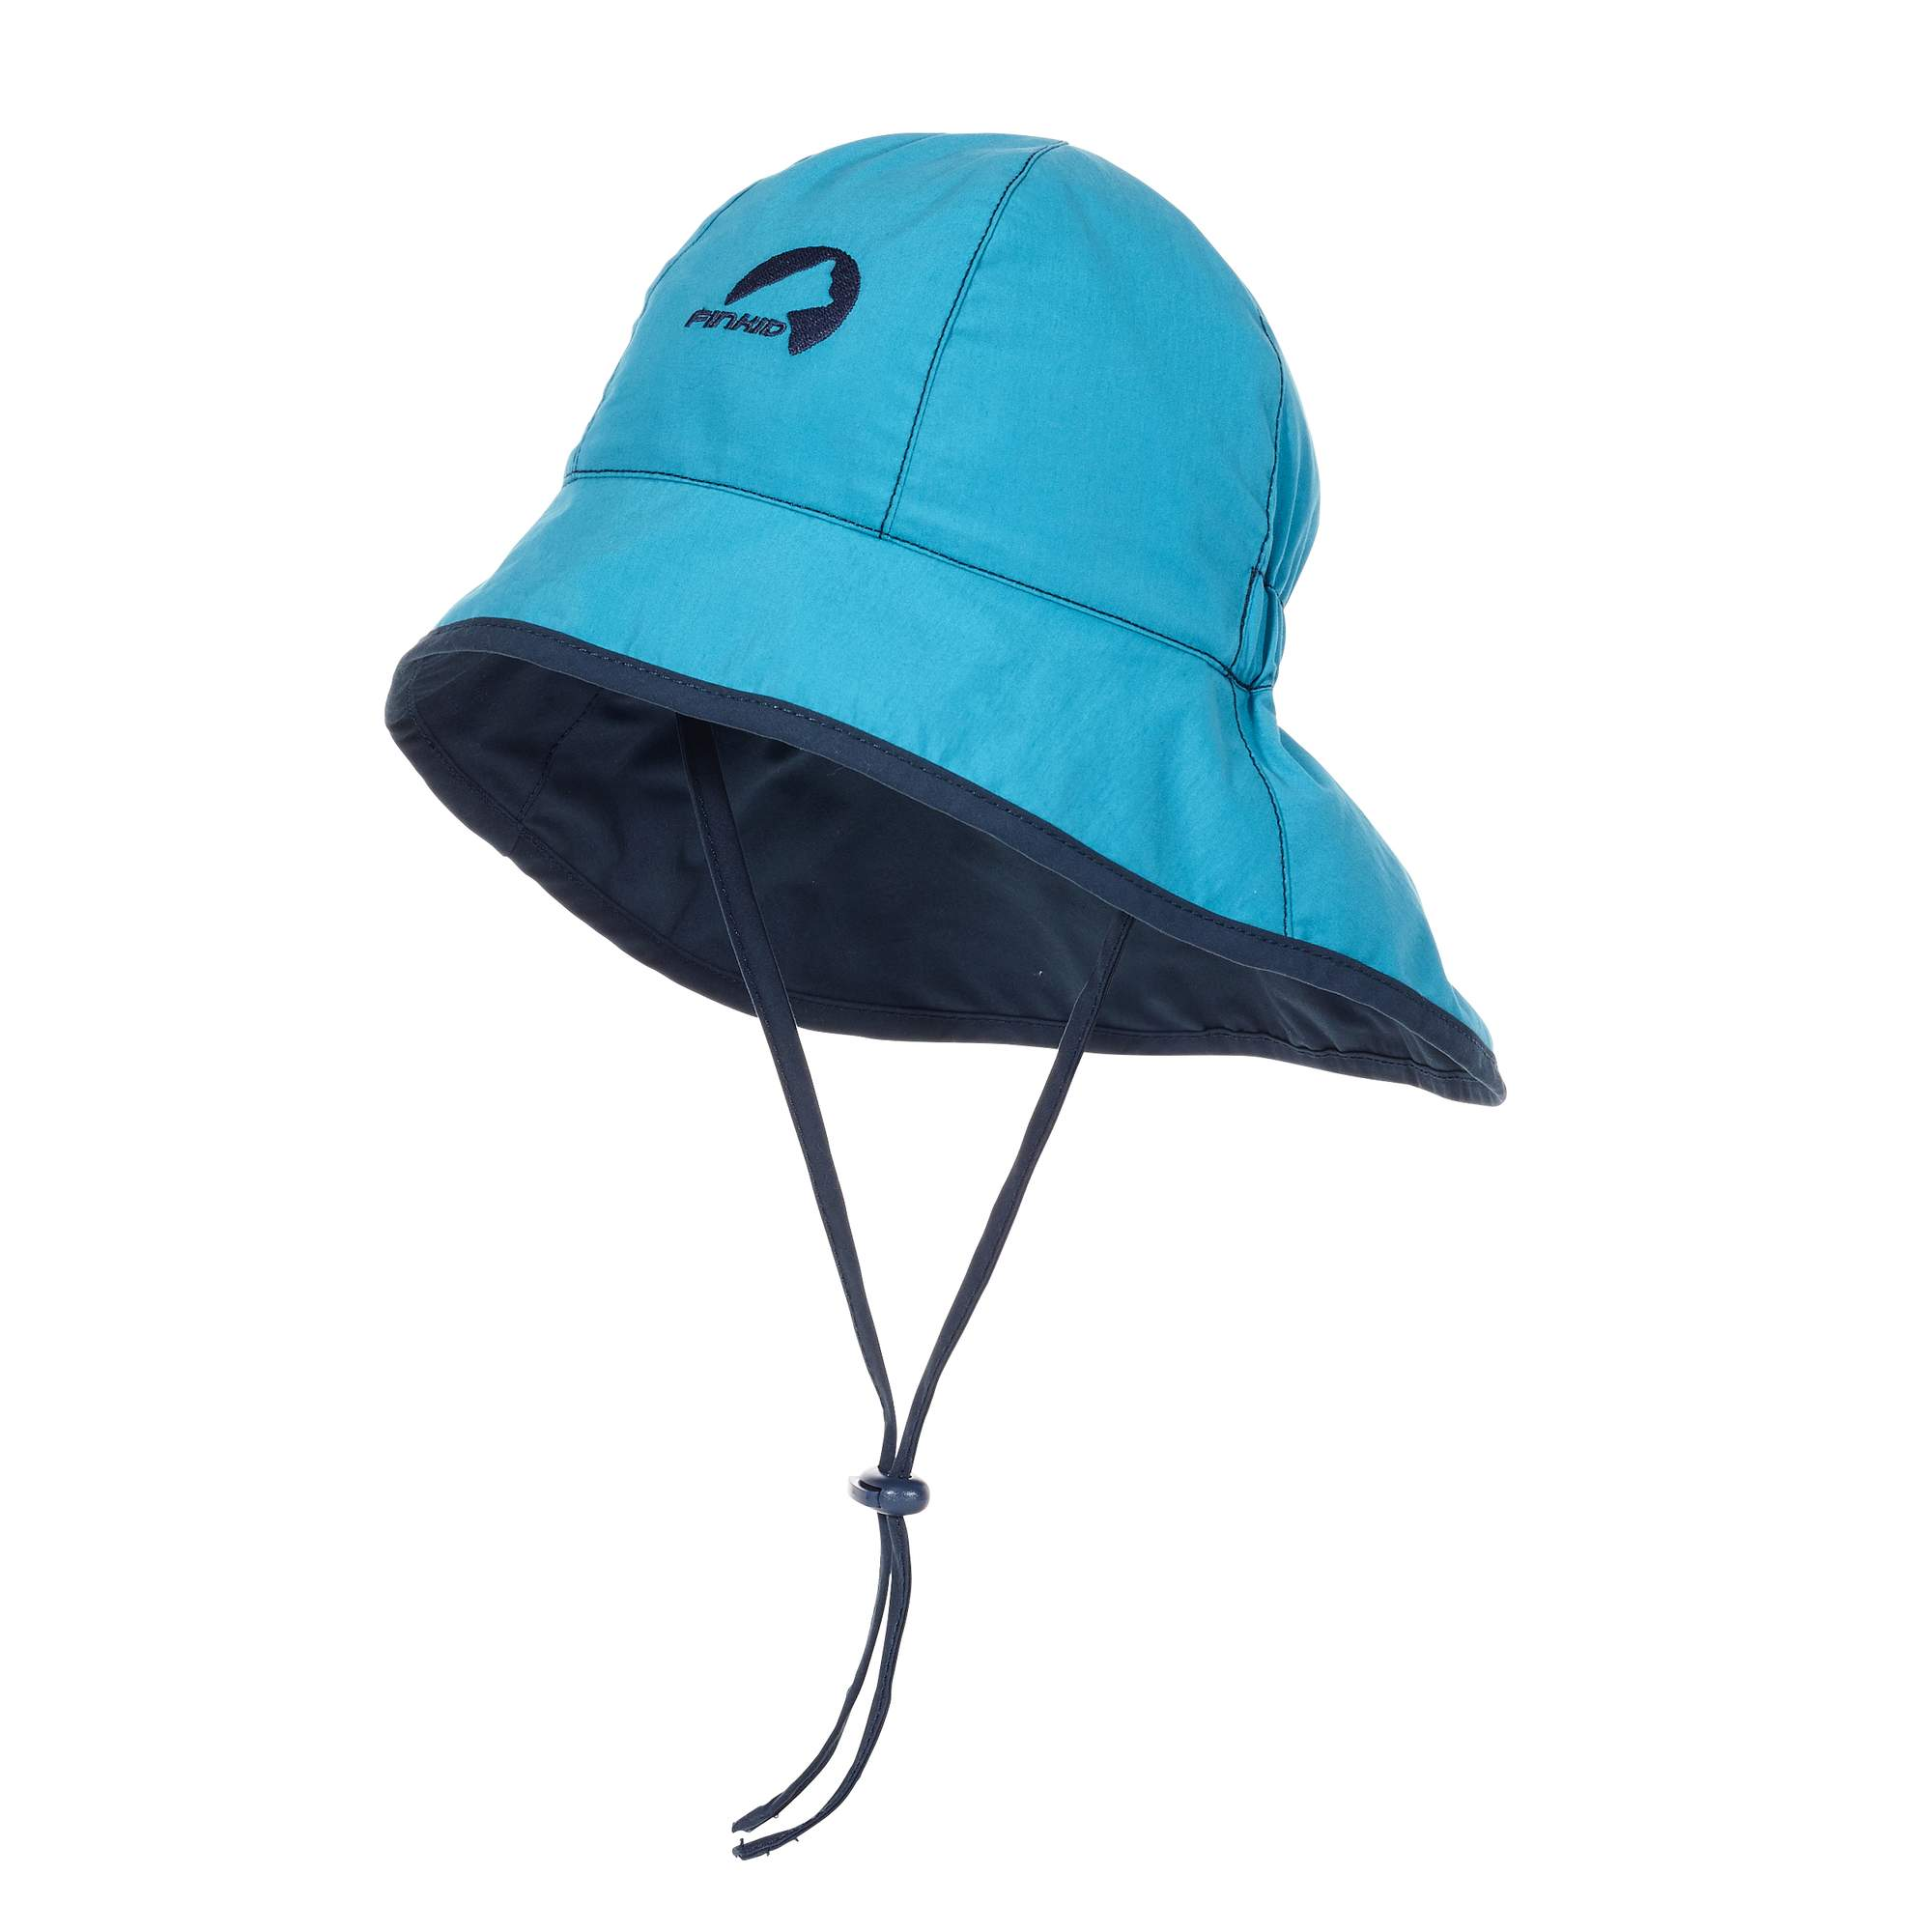 Finkid Ranta Sport Kinder Gr. 50 cm - blau / mosaic/navy - Hüte 6031099